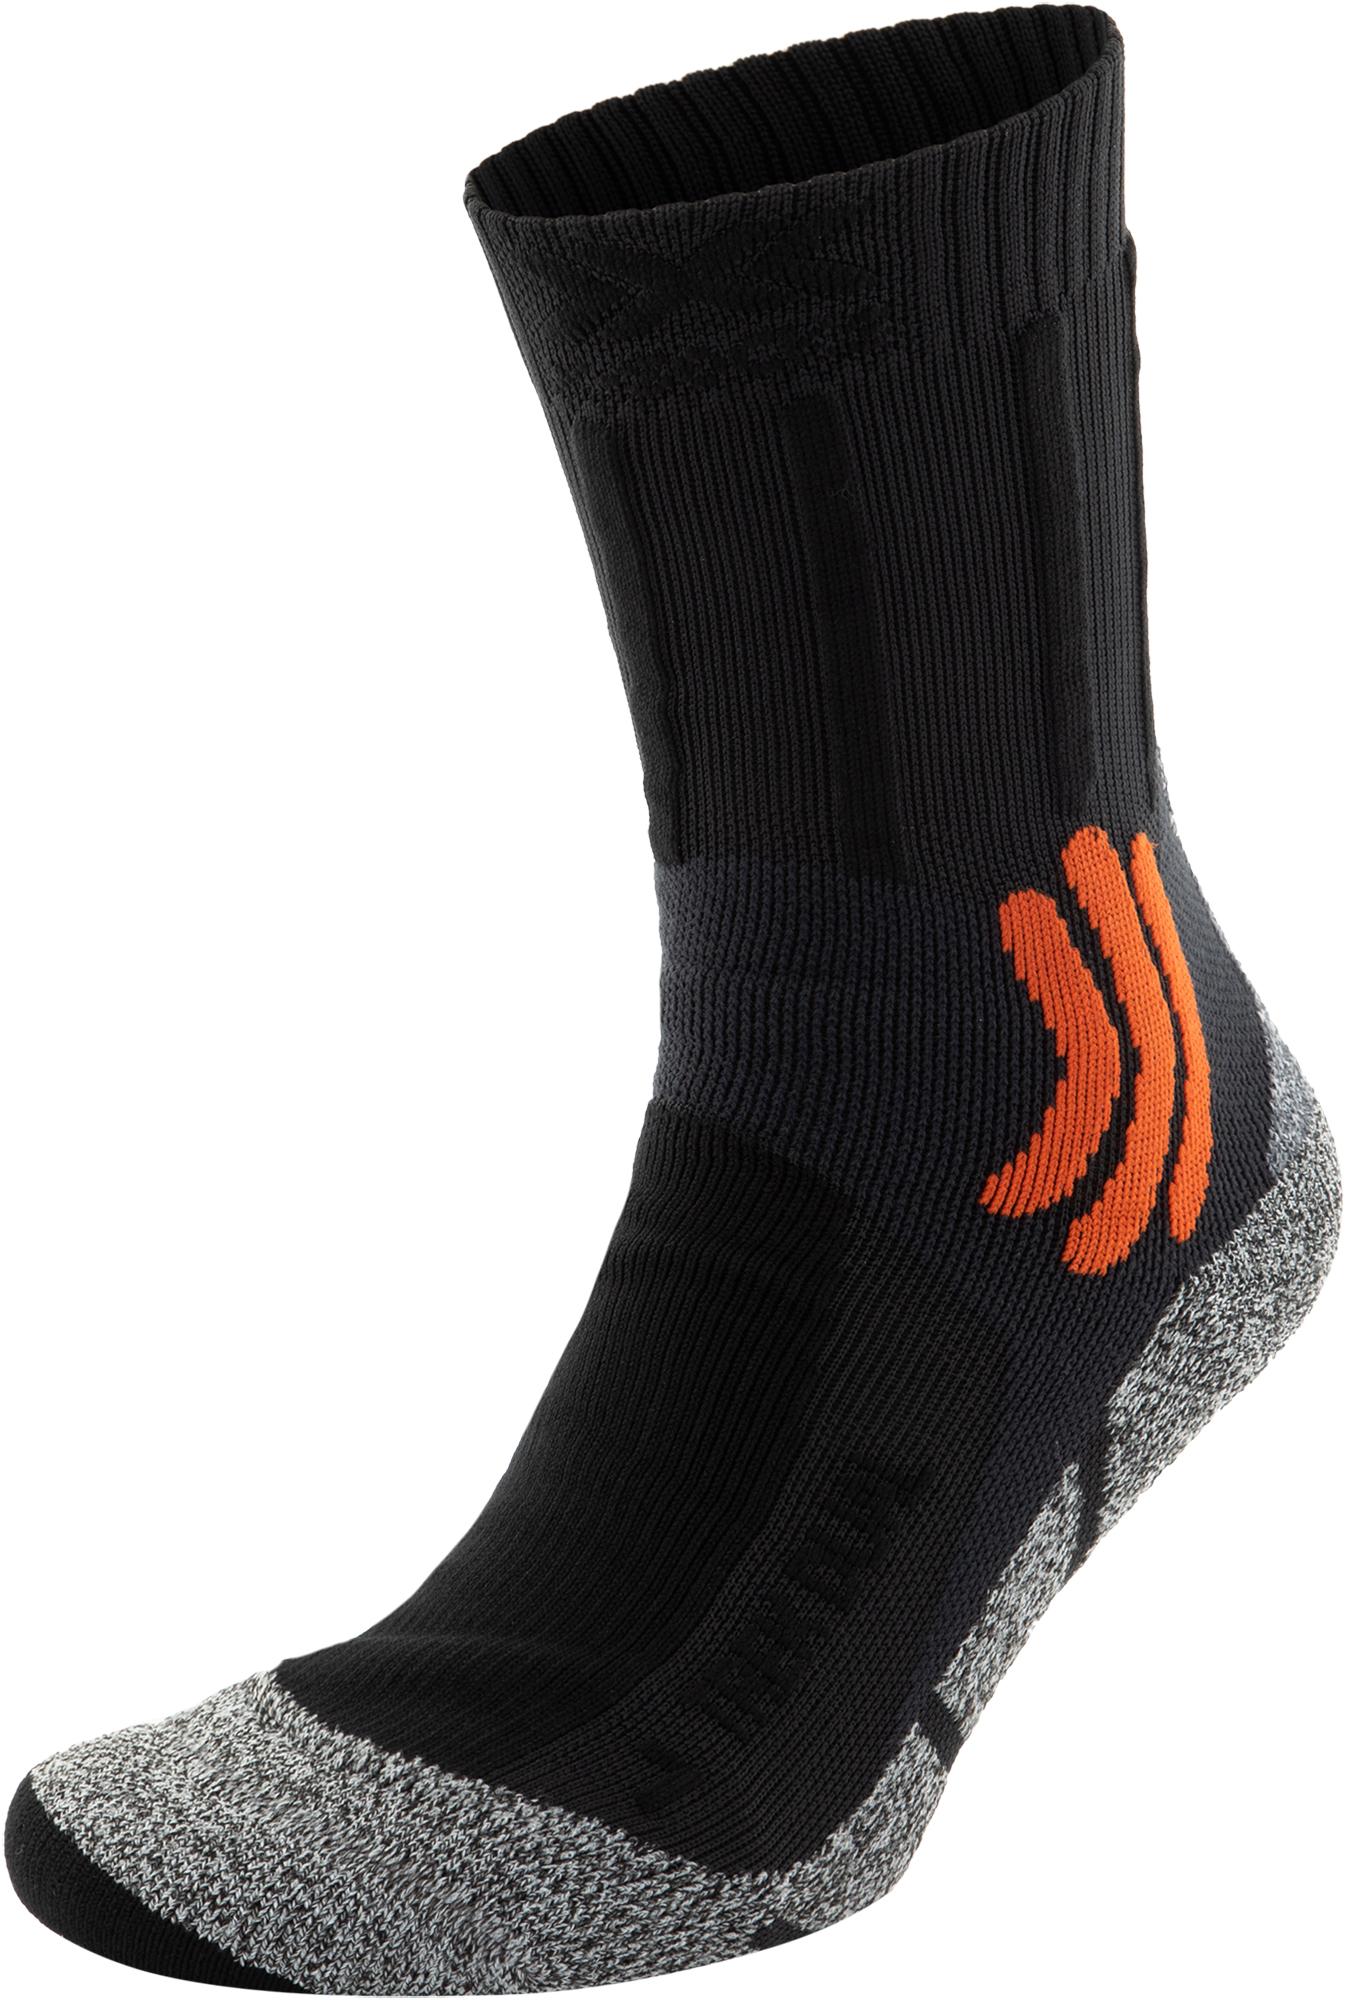 цена на X-Socks Носки X-Socks Trek, 1 пара, размер 45-47